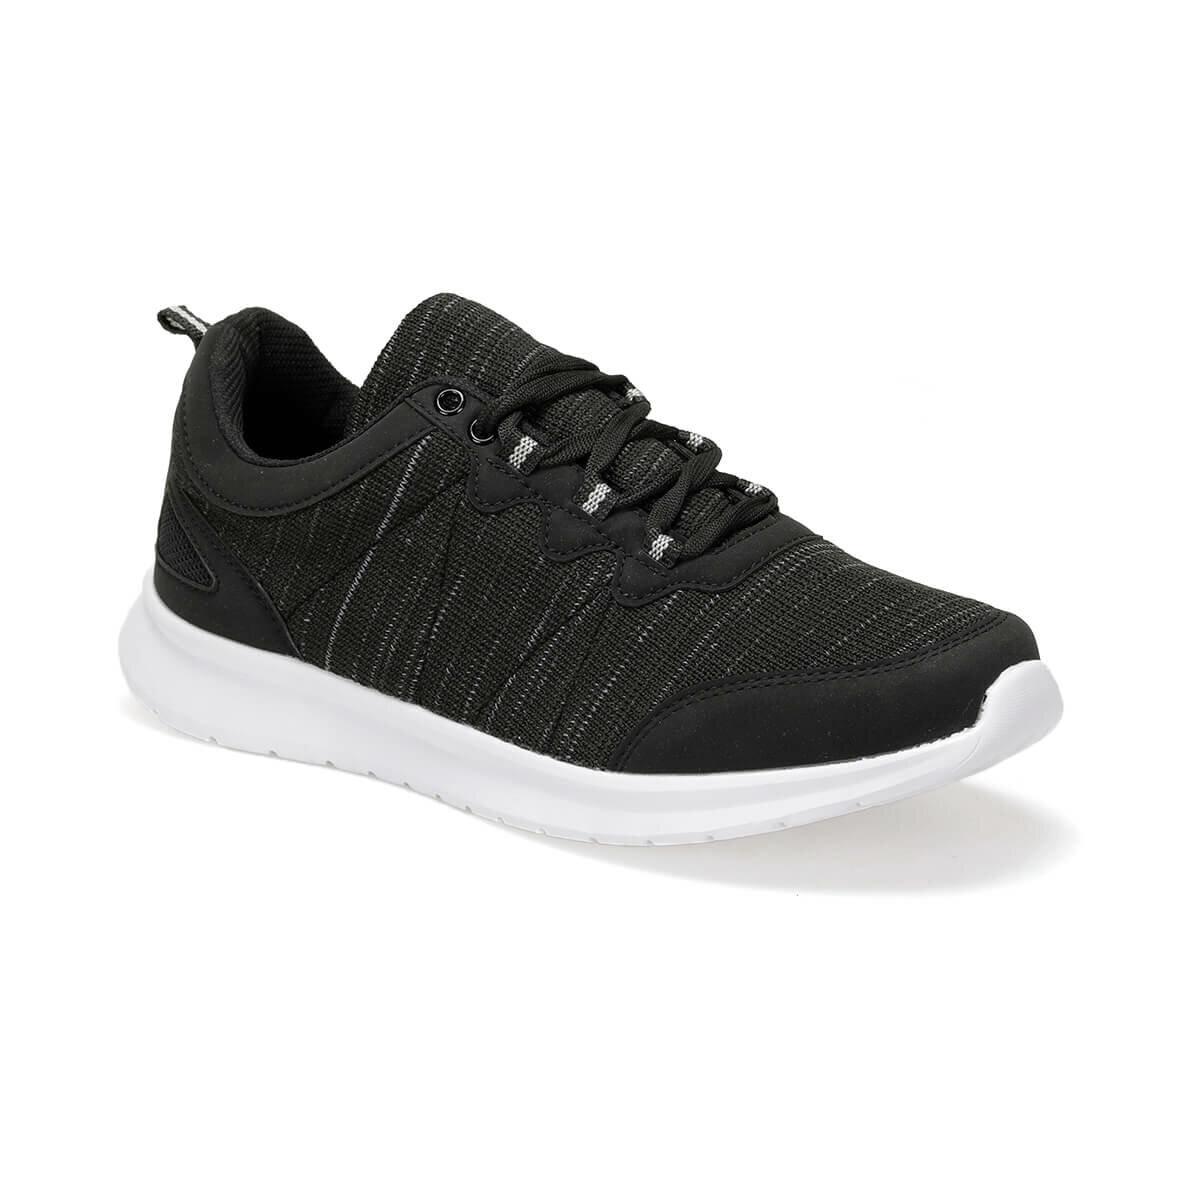 FLO STAND Navy Blue Men 'S Sneaker Shoes Torex